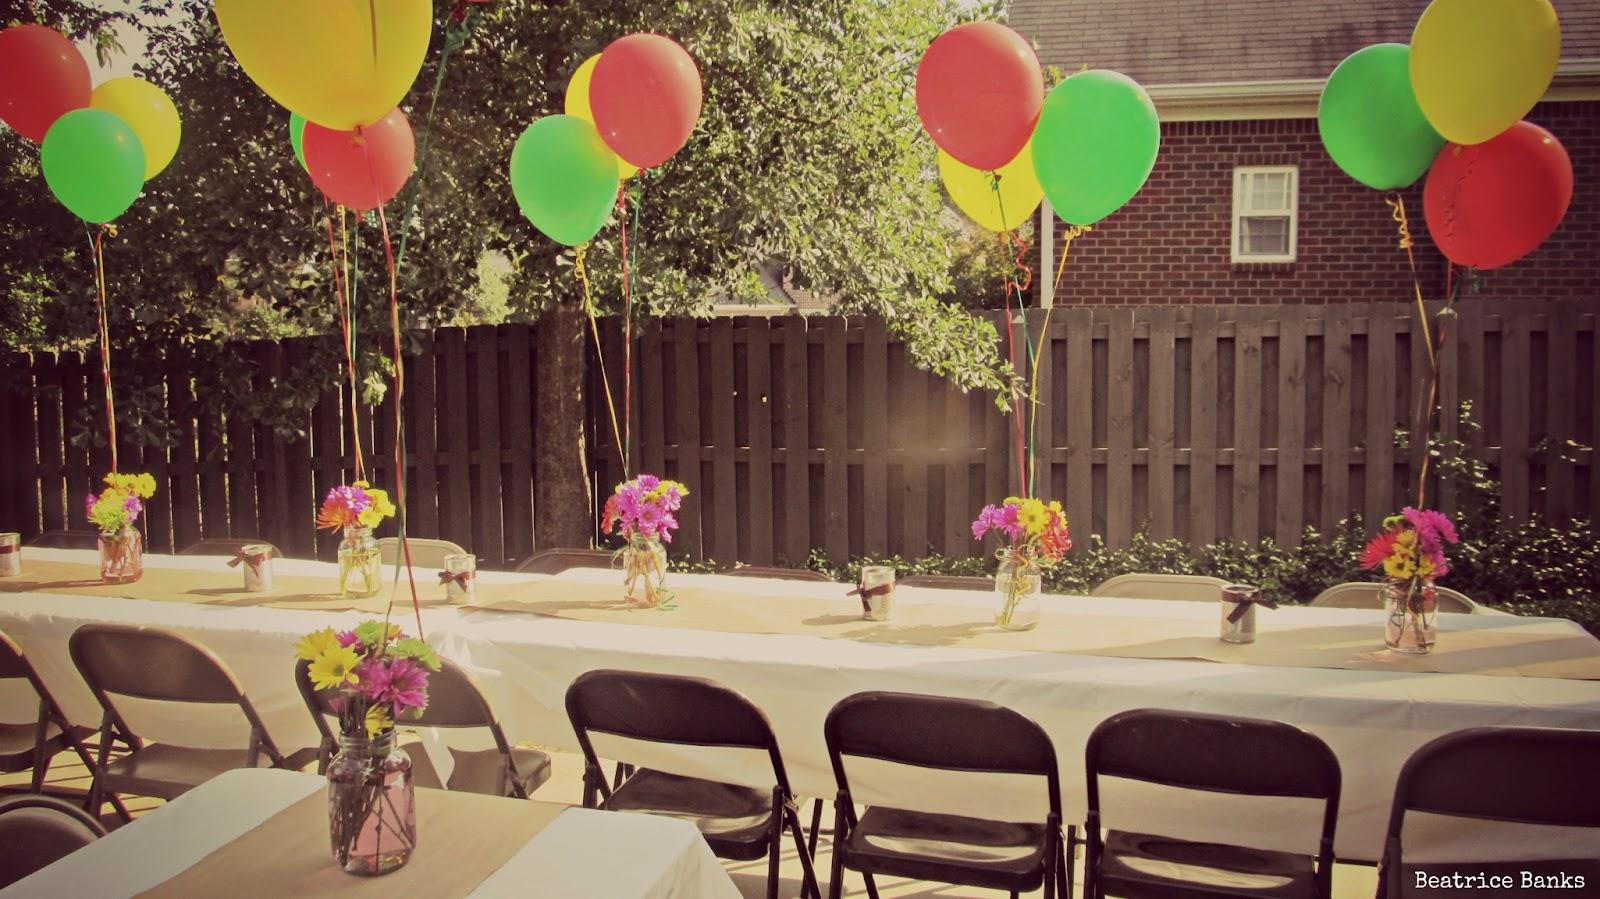 Beatrice Banks: Backyard Party